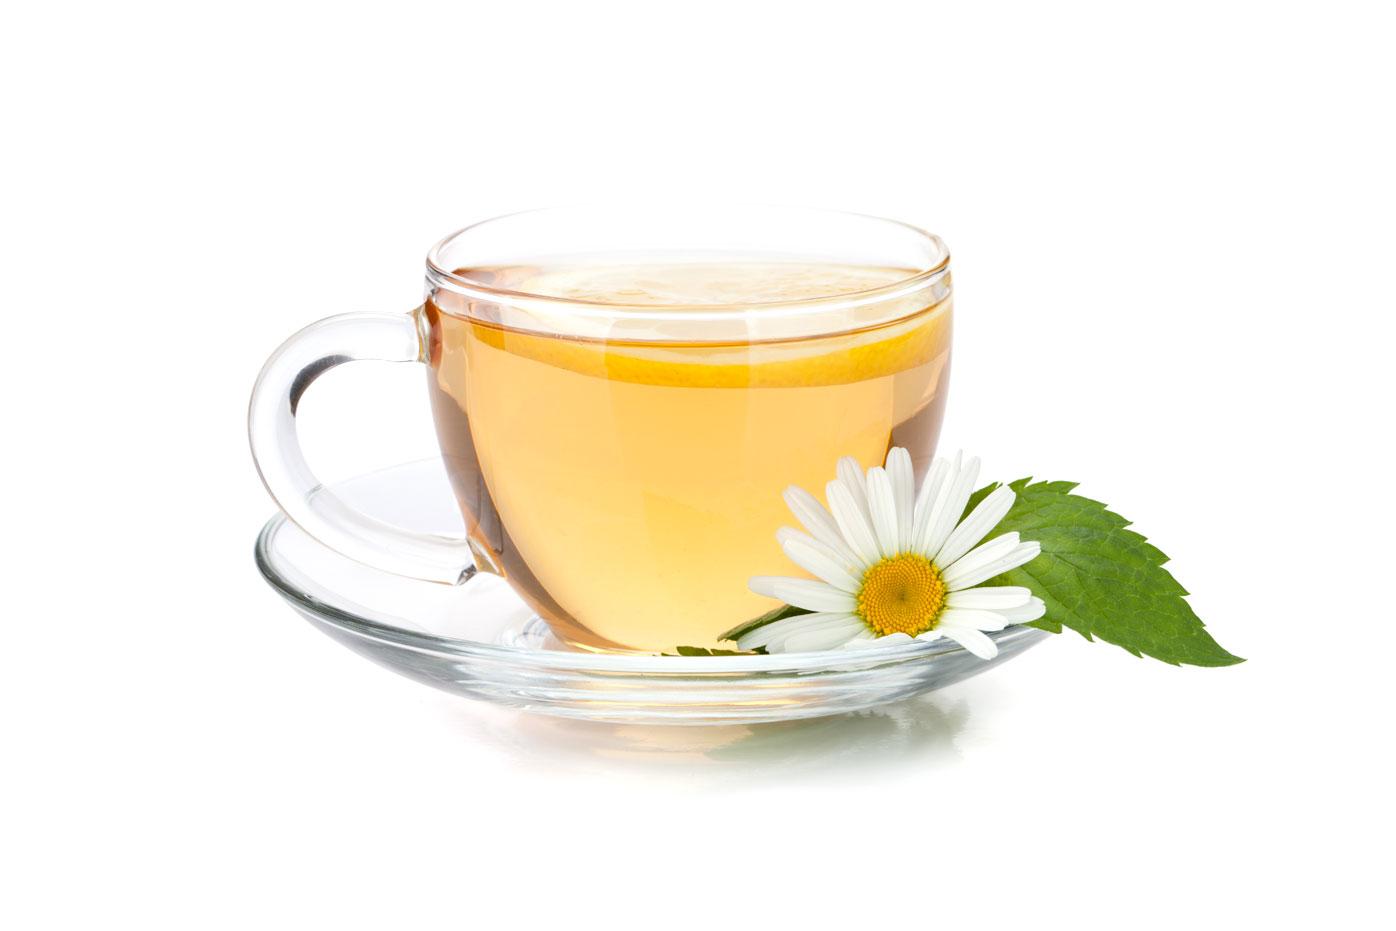 8 Benefits of Ginger Tea